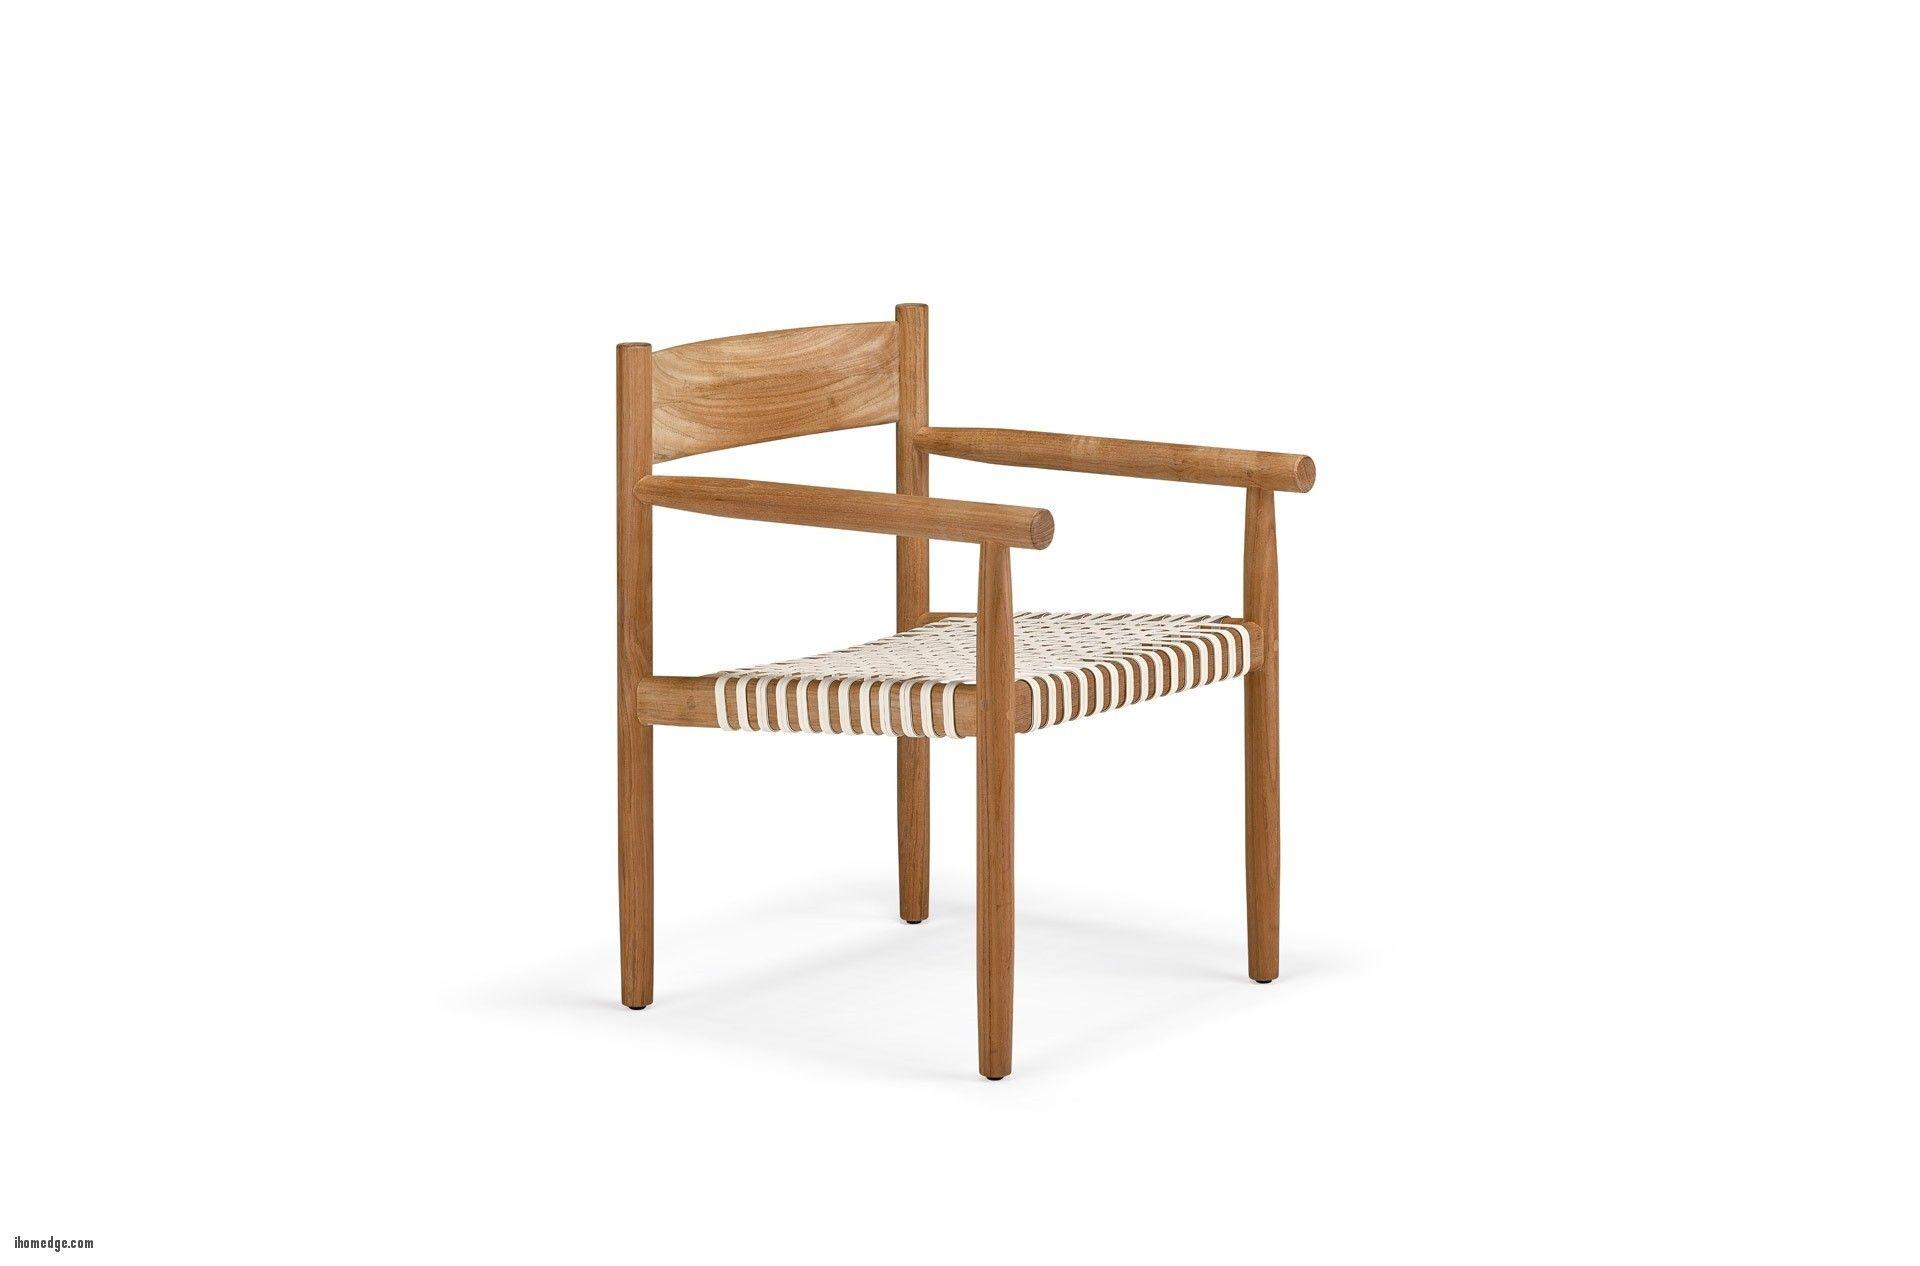 Inspirational Elegant Dedon Outdoor Furniture , Barber And Osgerby Dedon  Tibbo Armchair , Http://ihomedge.com/dedon Outdoor Furniture/18394